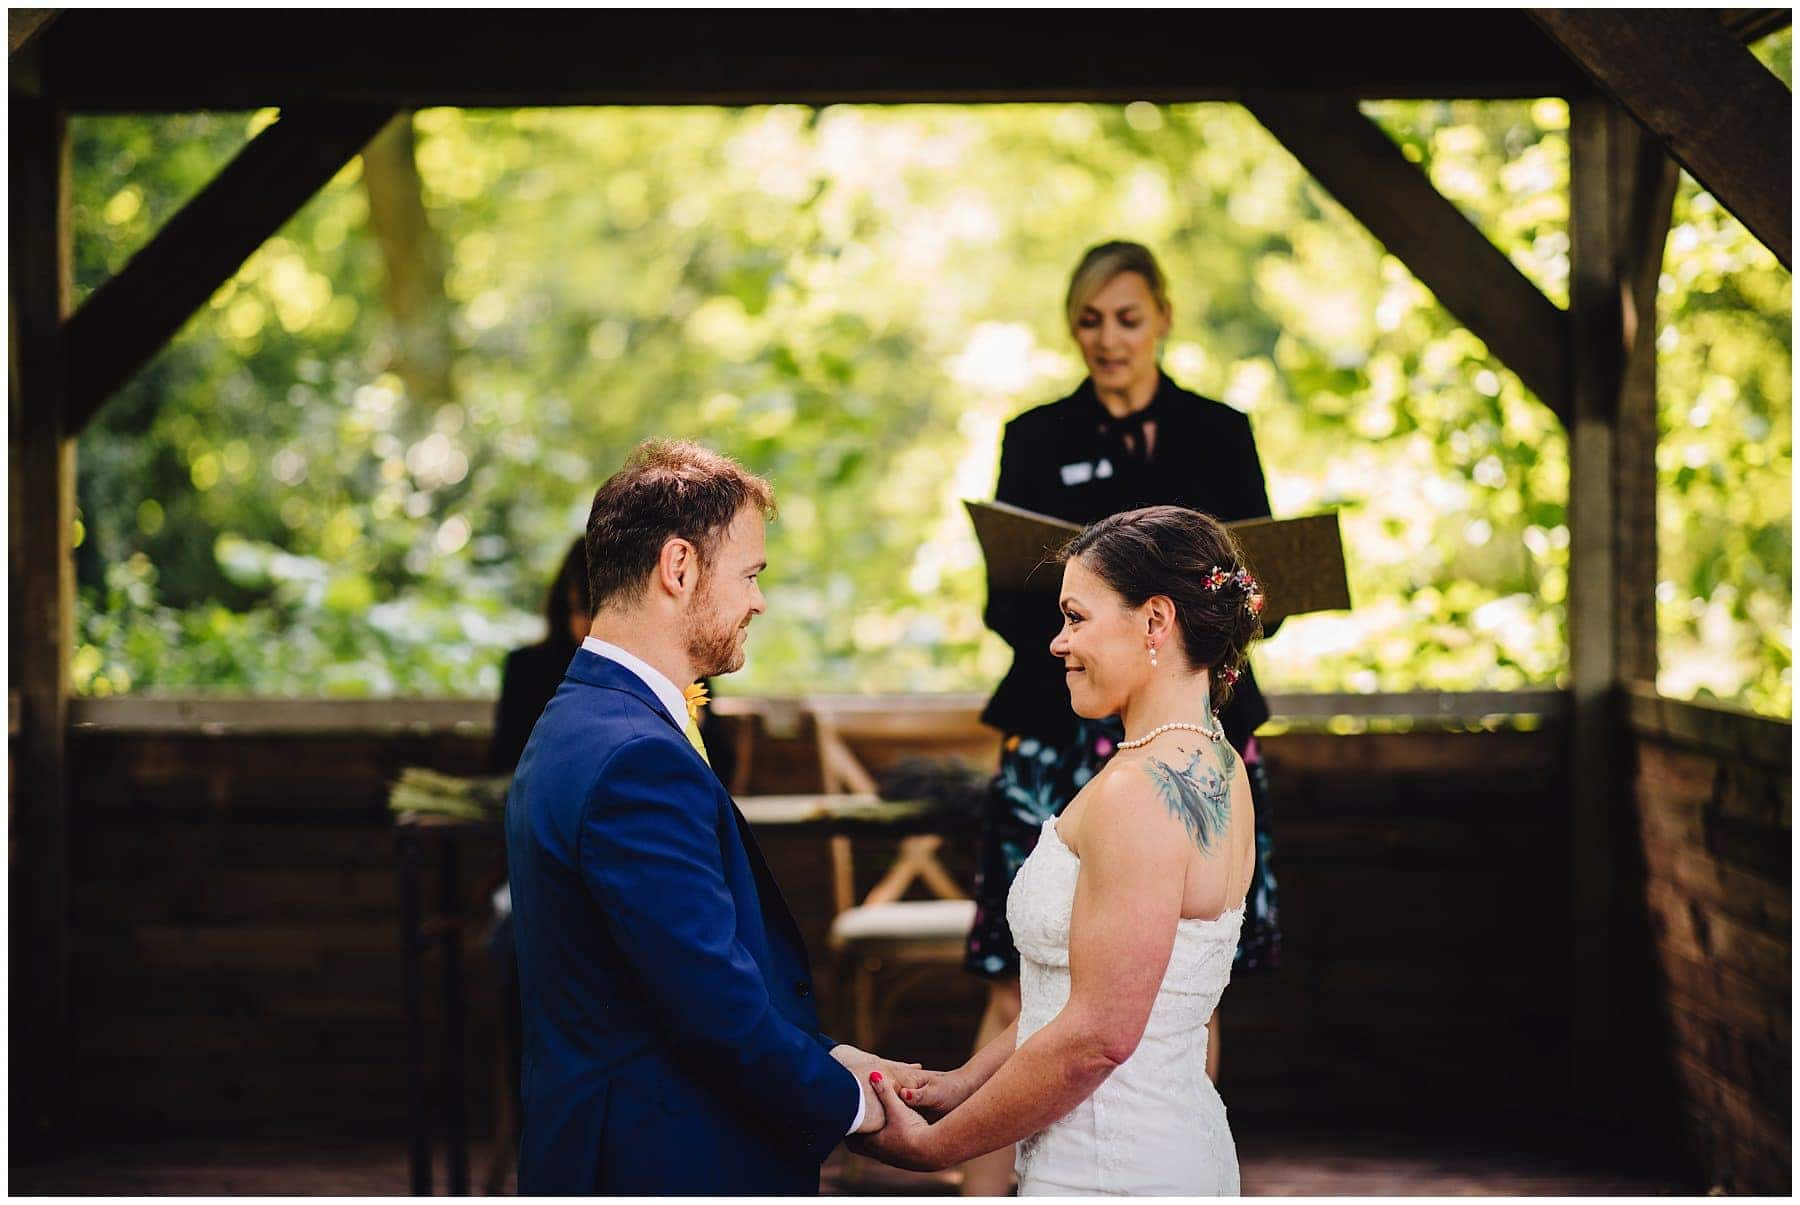 Hothorp Hall Woodlands Wedding Photographer 24